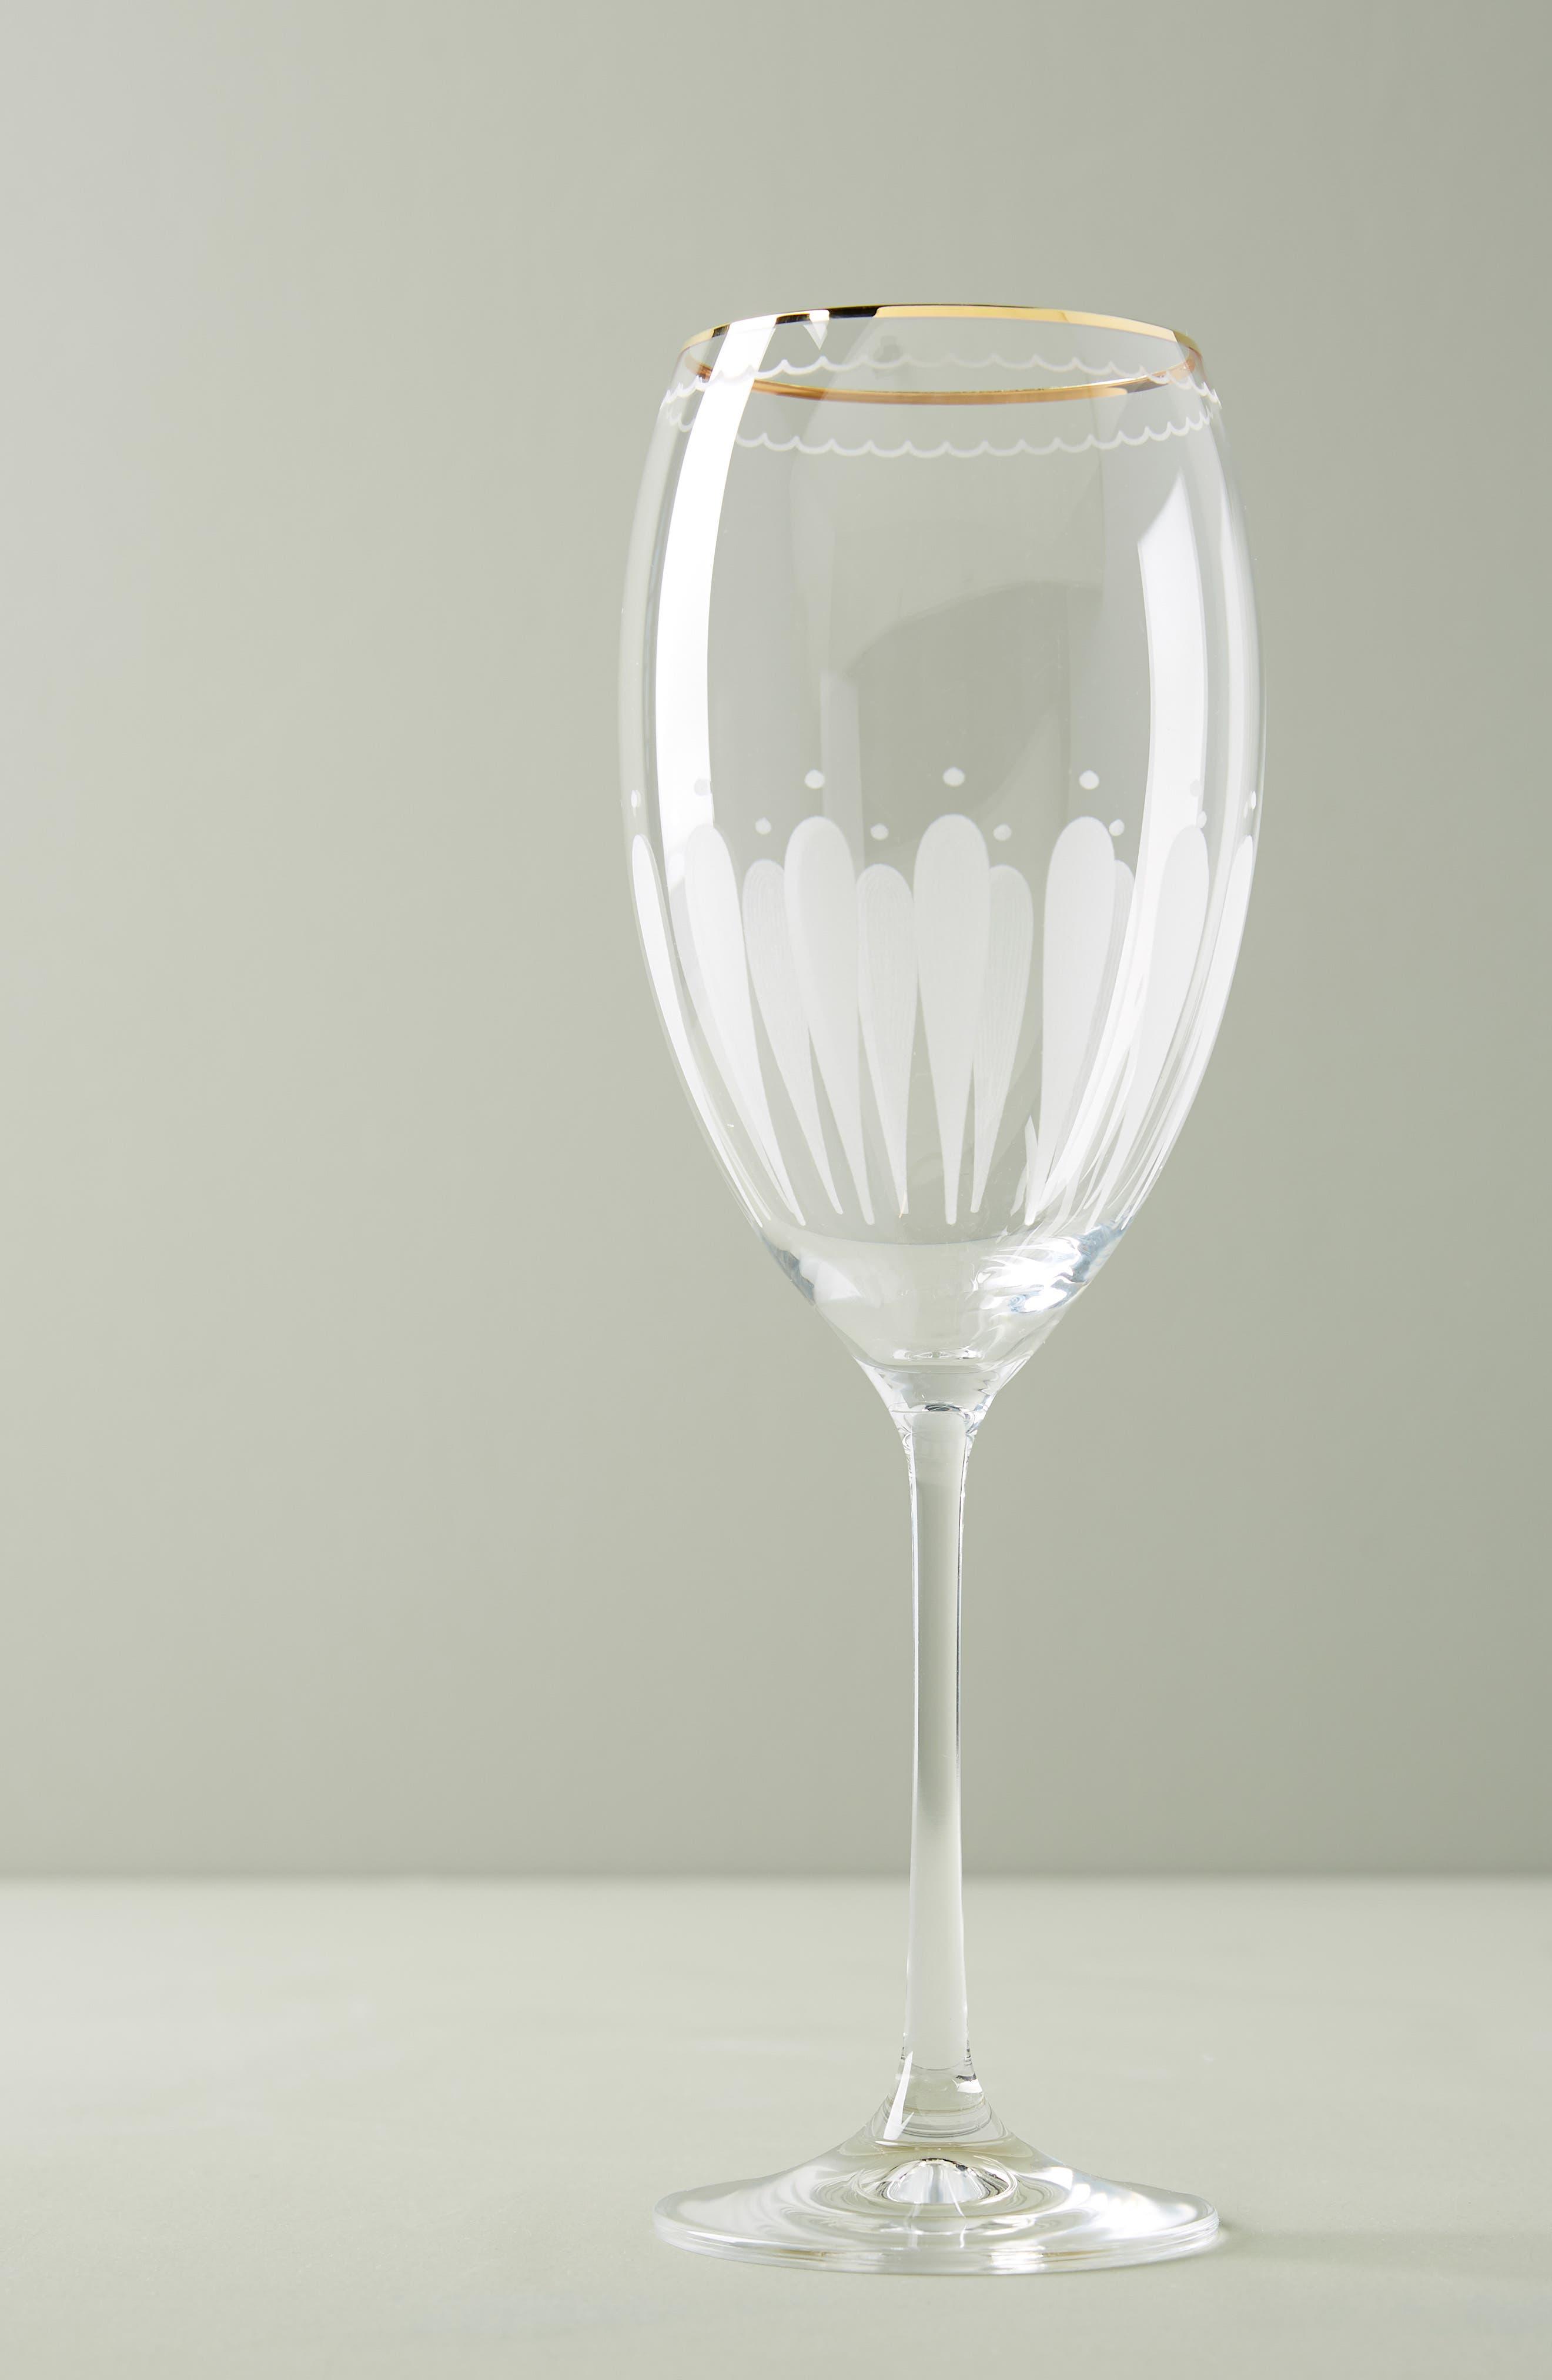 Odele Set of 4 Wine Glasses, Main, color, CLEAR